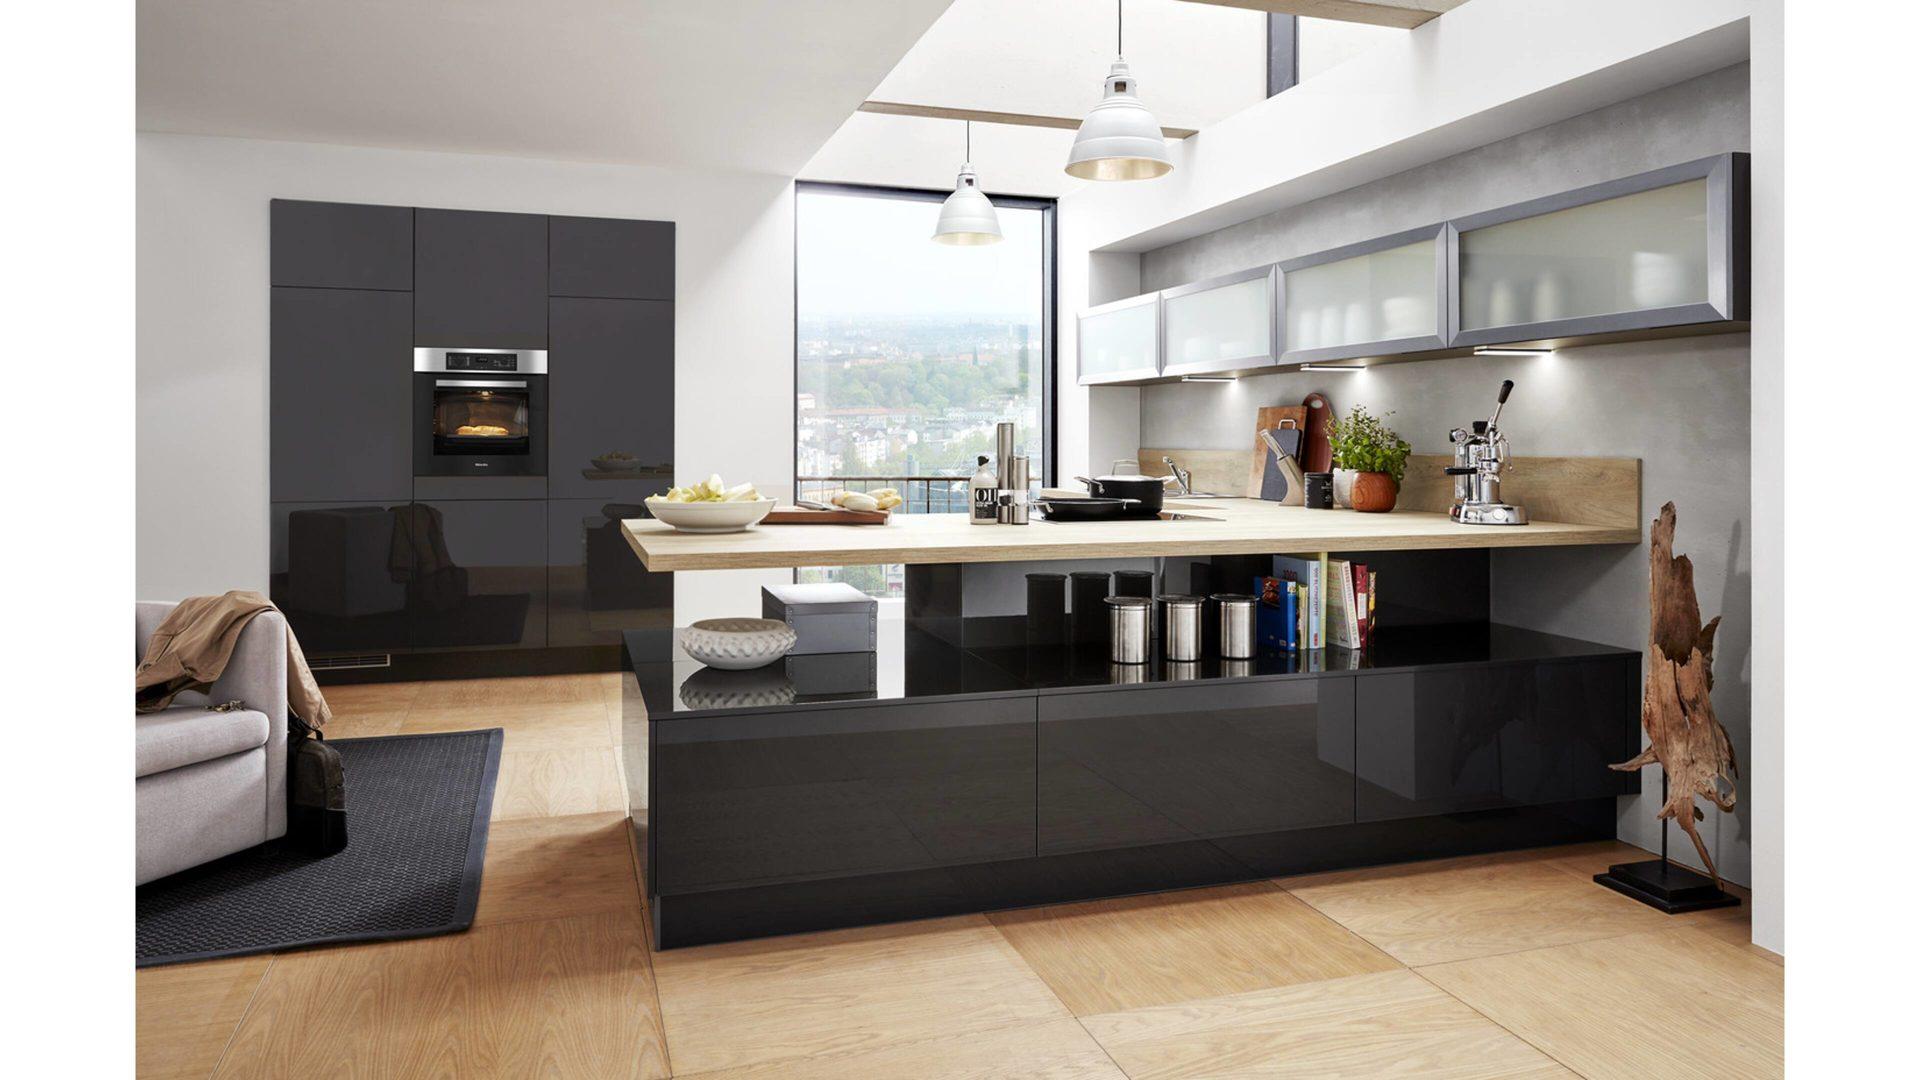 Culineo Küche mit MIELE Einbaugeräten, mahattangraue Lackfronten ...